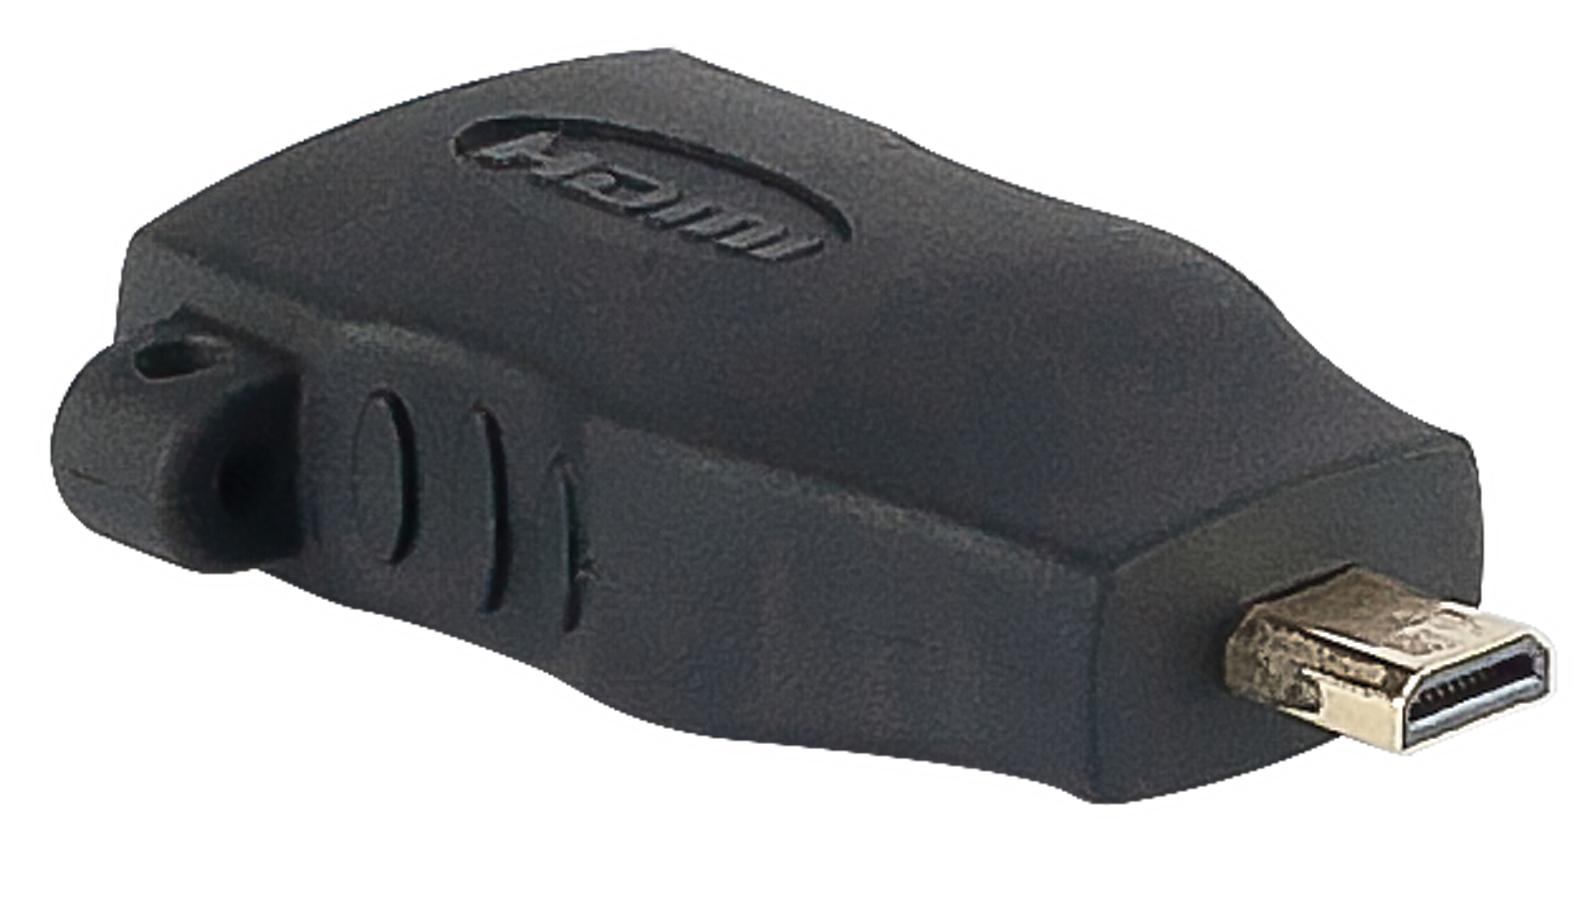 Adapter Mini HDMI C Male to HDMI A female